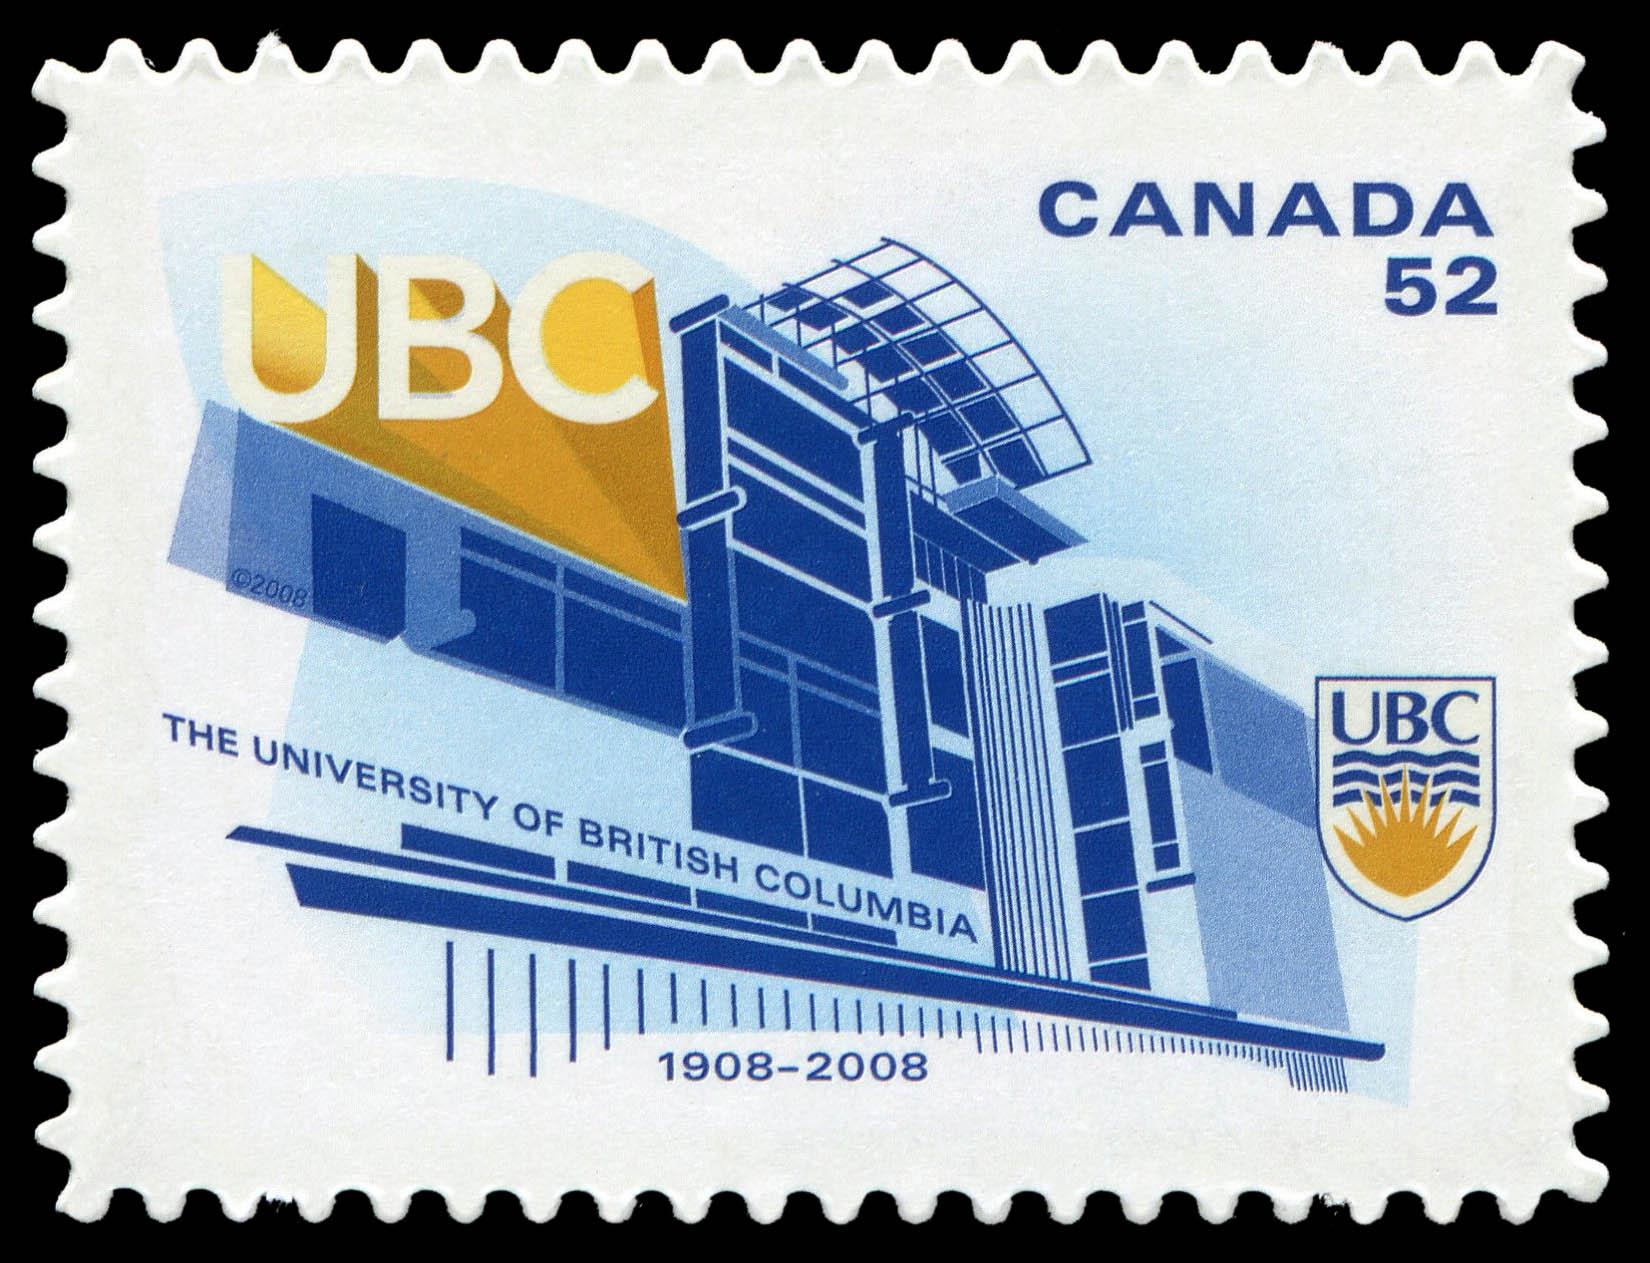 The University of British Columbia - 1908-2008 Canada Postage Stamp   Canadian Universities